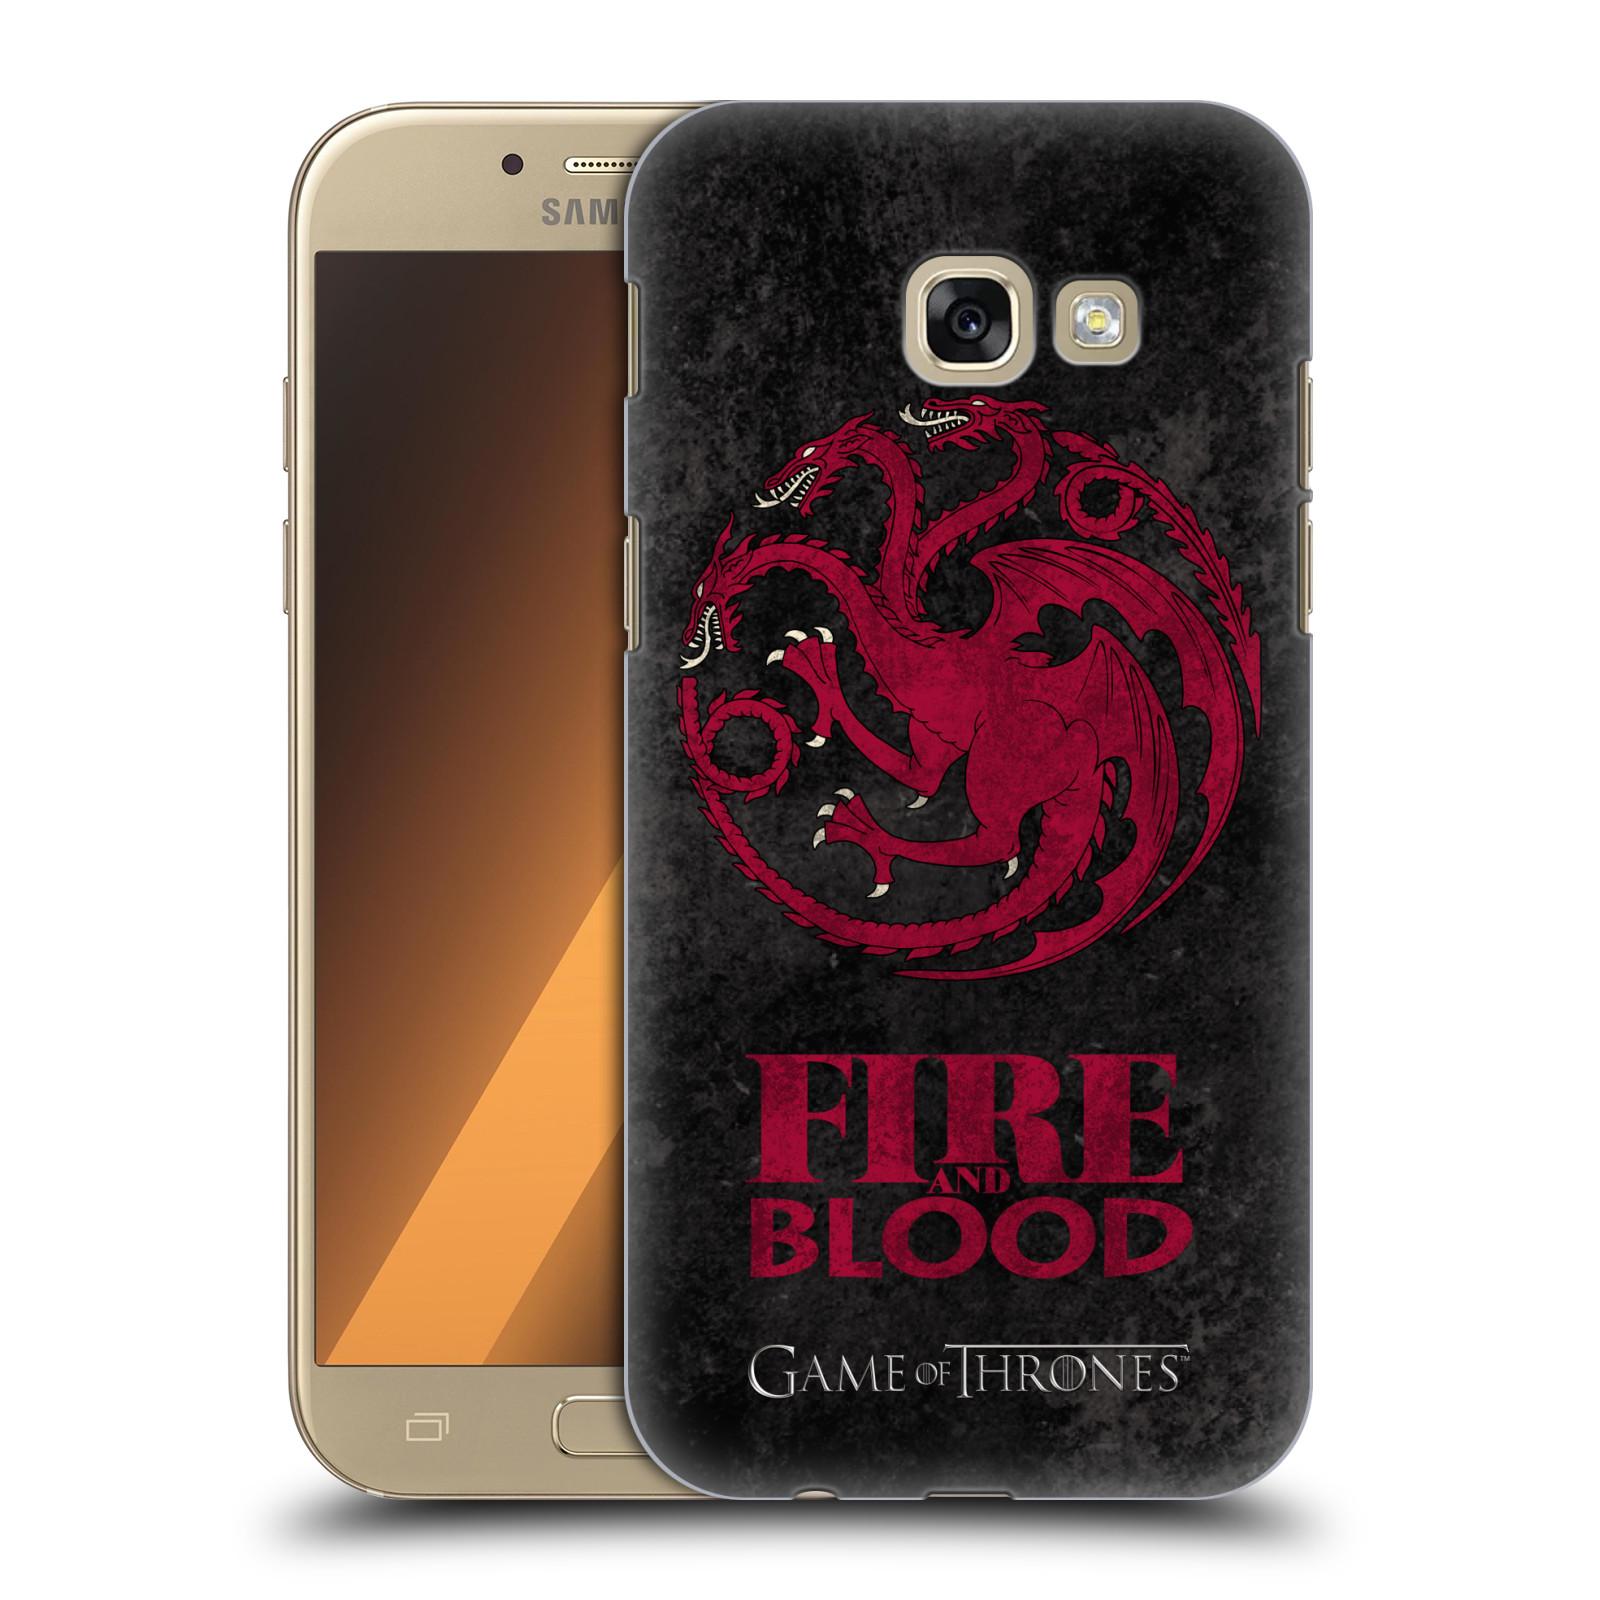 Plastové pouzdro na mobil Samsung Galaxy A5 (2017) HEAD CASE Hra o trůny - Sigils Targaryen - Fire and Blood